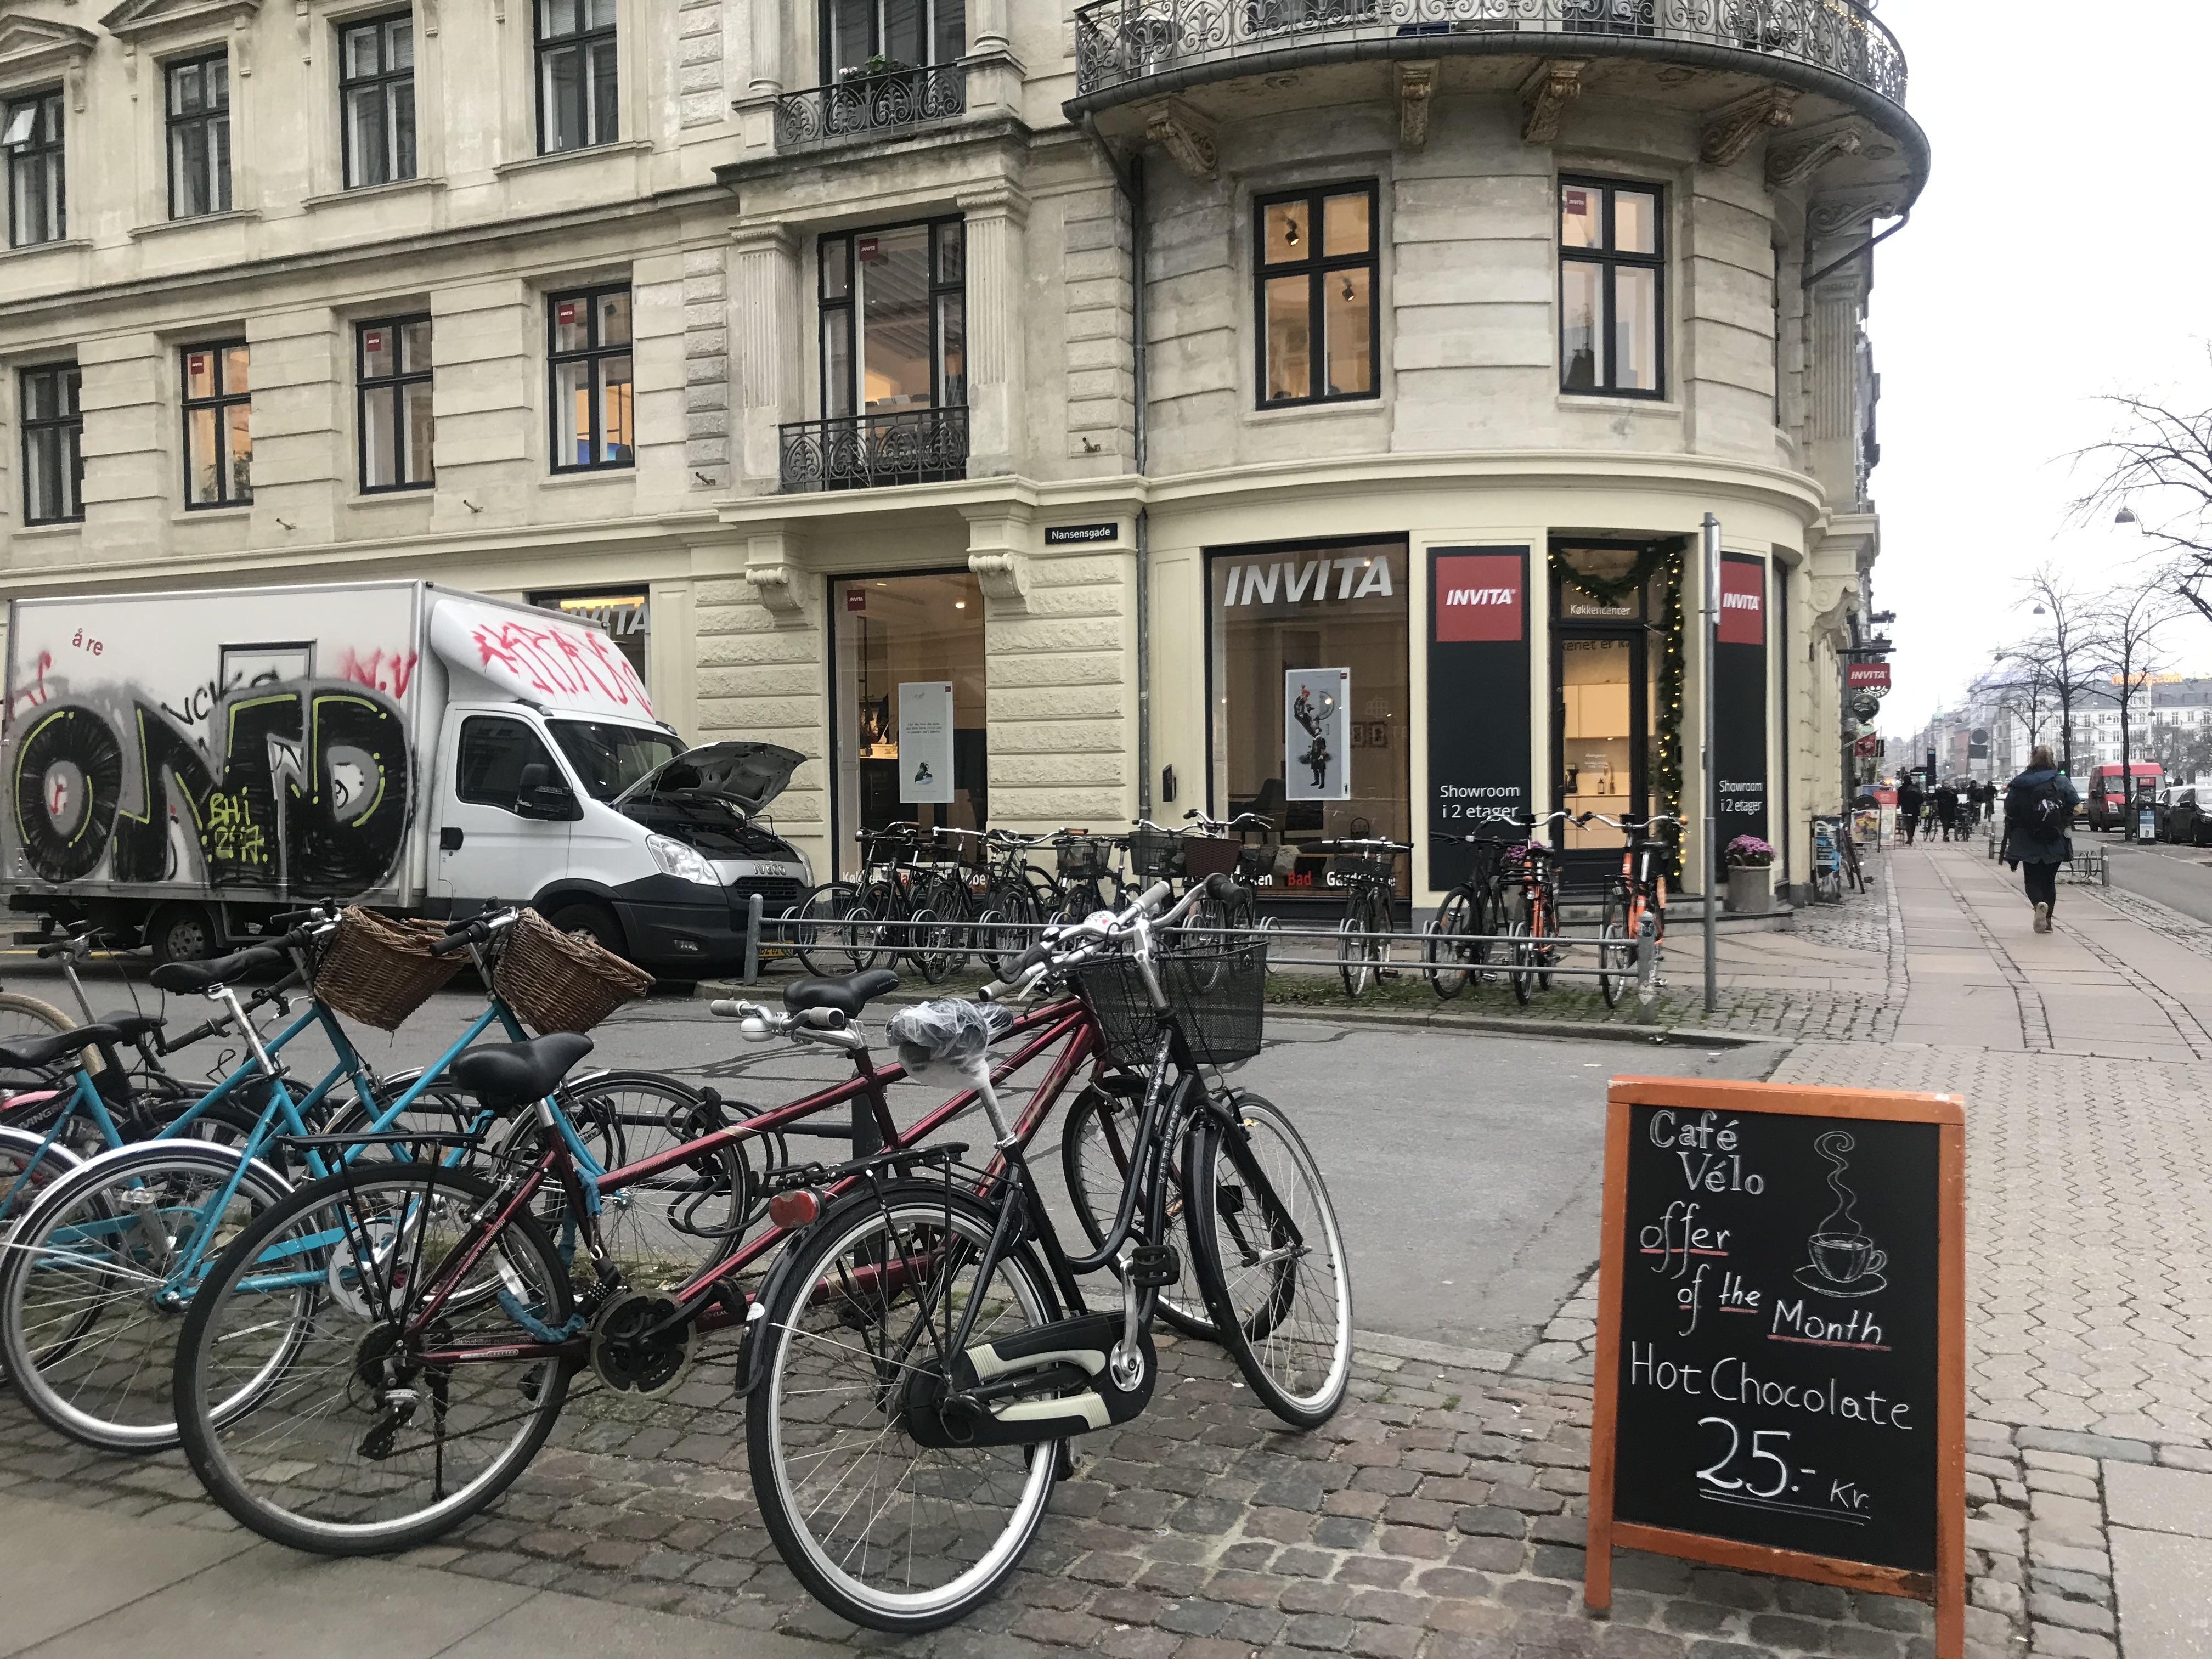 withコロナ時代の地域とは?教育とは? デンマークの自治区・クリスチャニアに学ぶ地域の未来